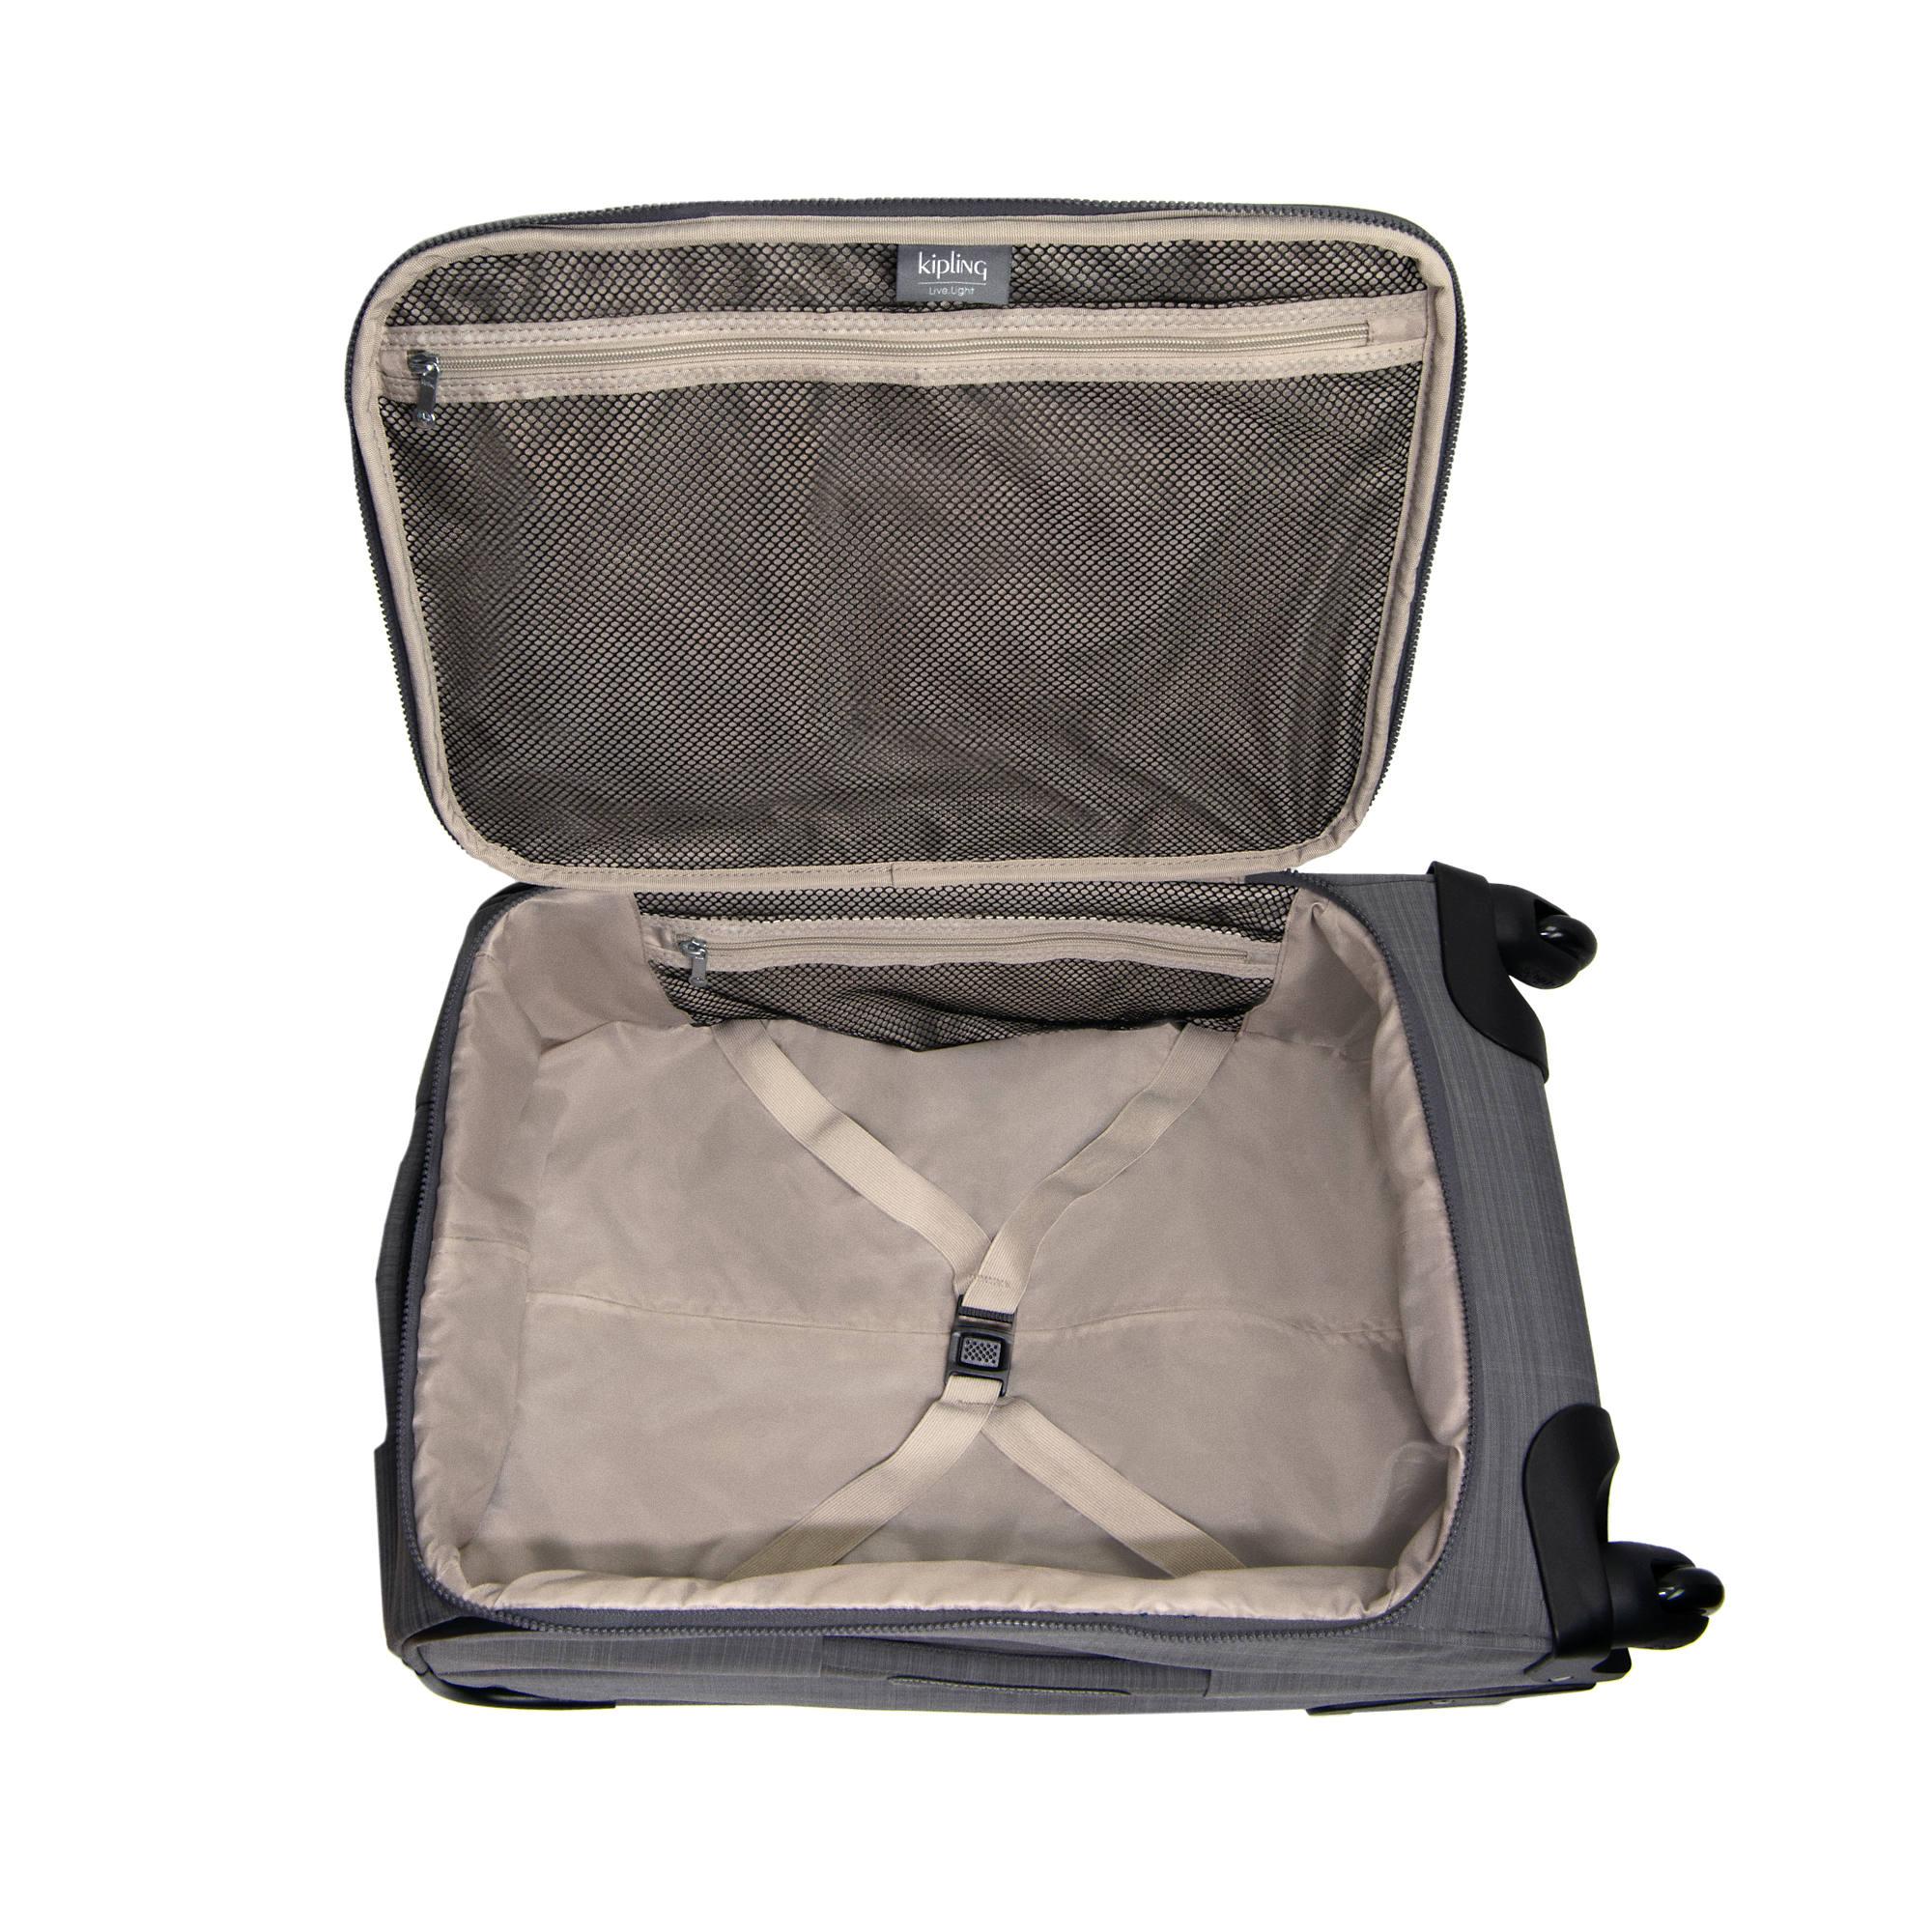 403c2b72687 Youri Spin 55 Small Luggage,Dusty Grey Dazz,large